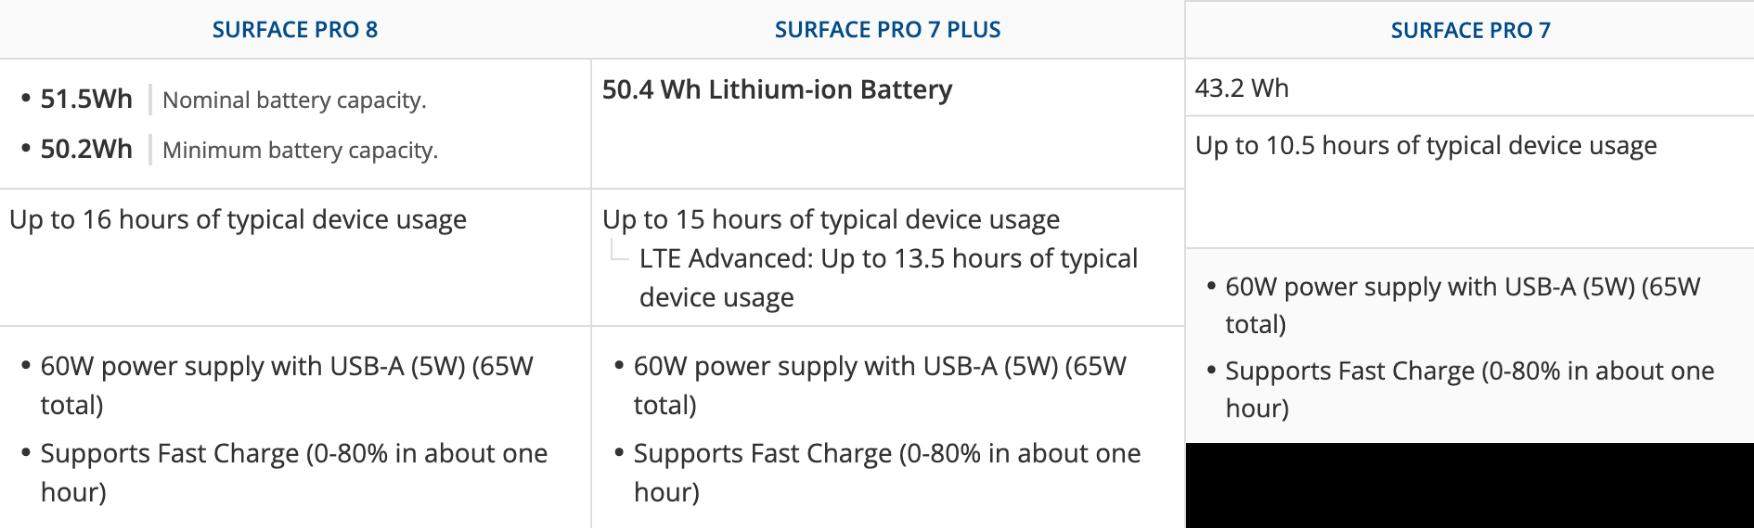 Compare Surface Pro 8 vs Surface Pro 7 Plus vs Surface Pro 7 Battery